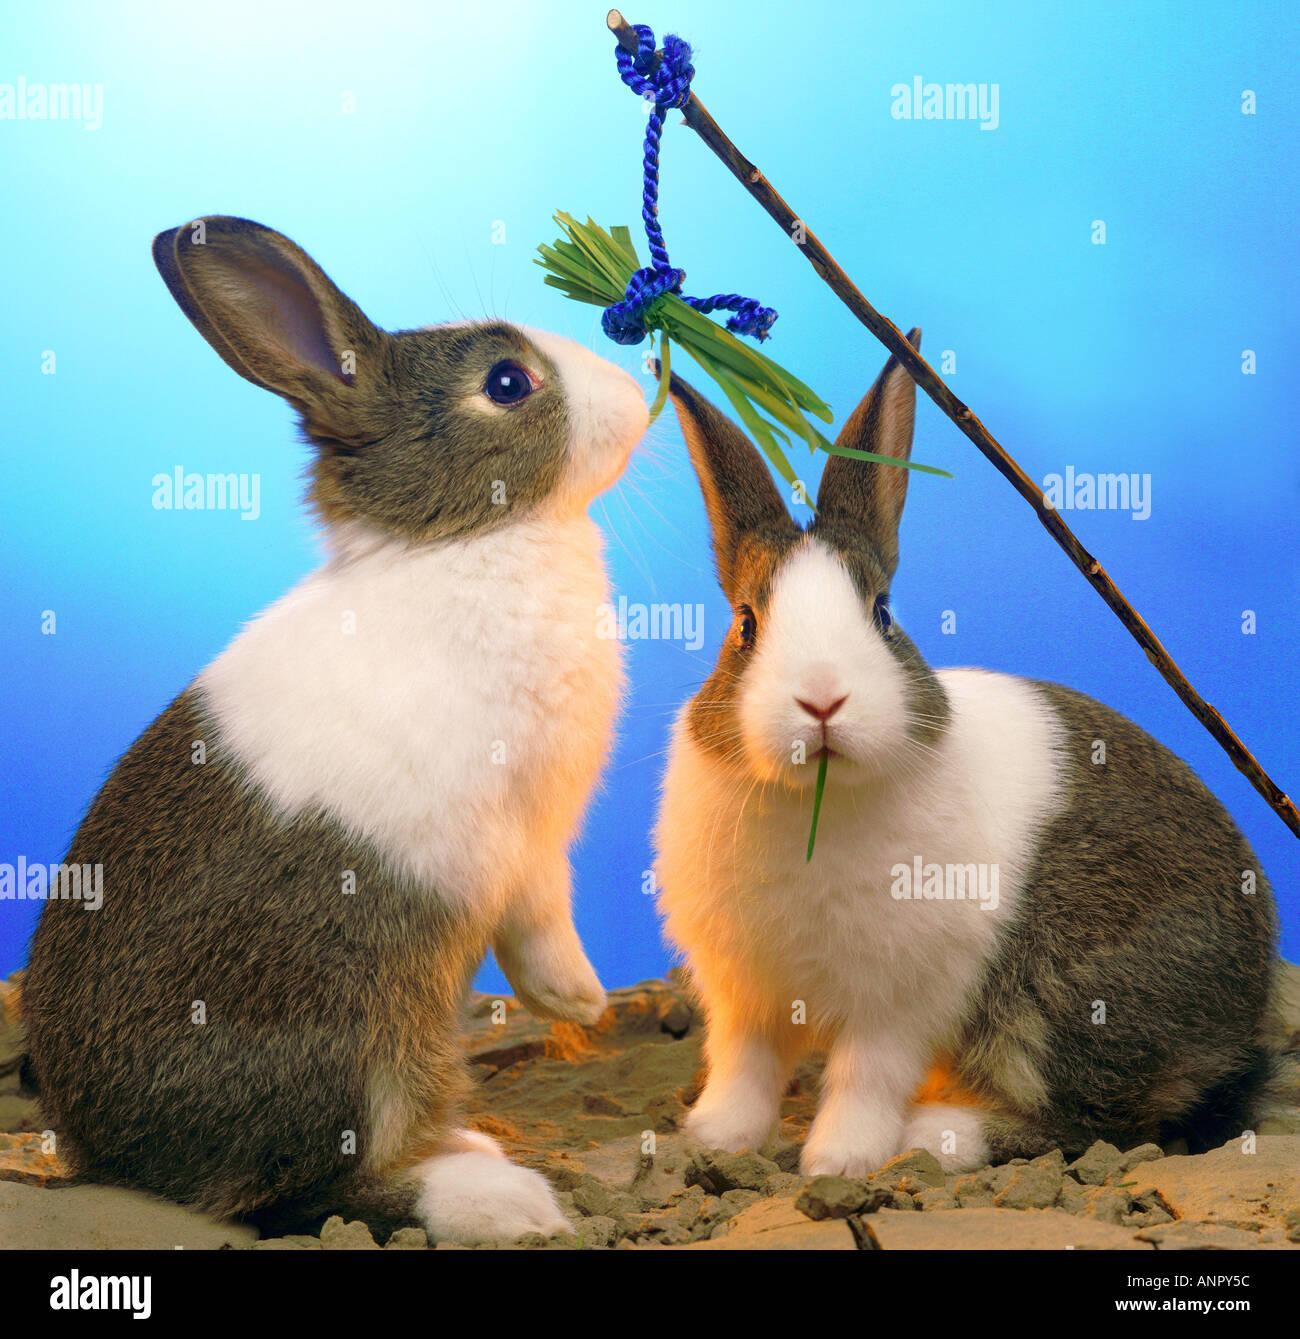 Angeln Fur Kaninchen Witz Spass Humor Witzig Tiere Stockfotografie